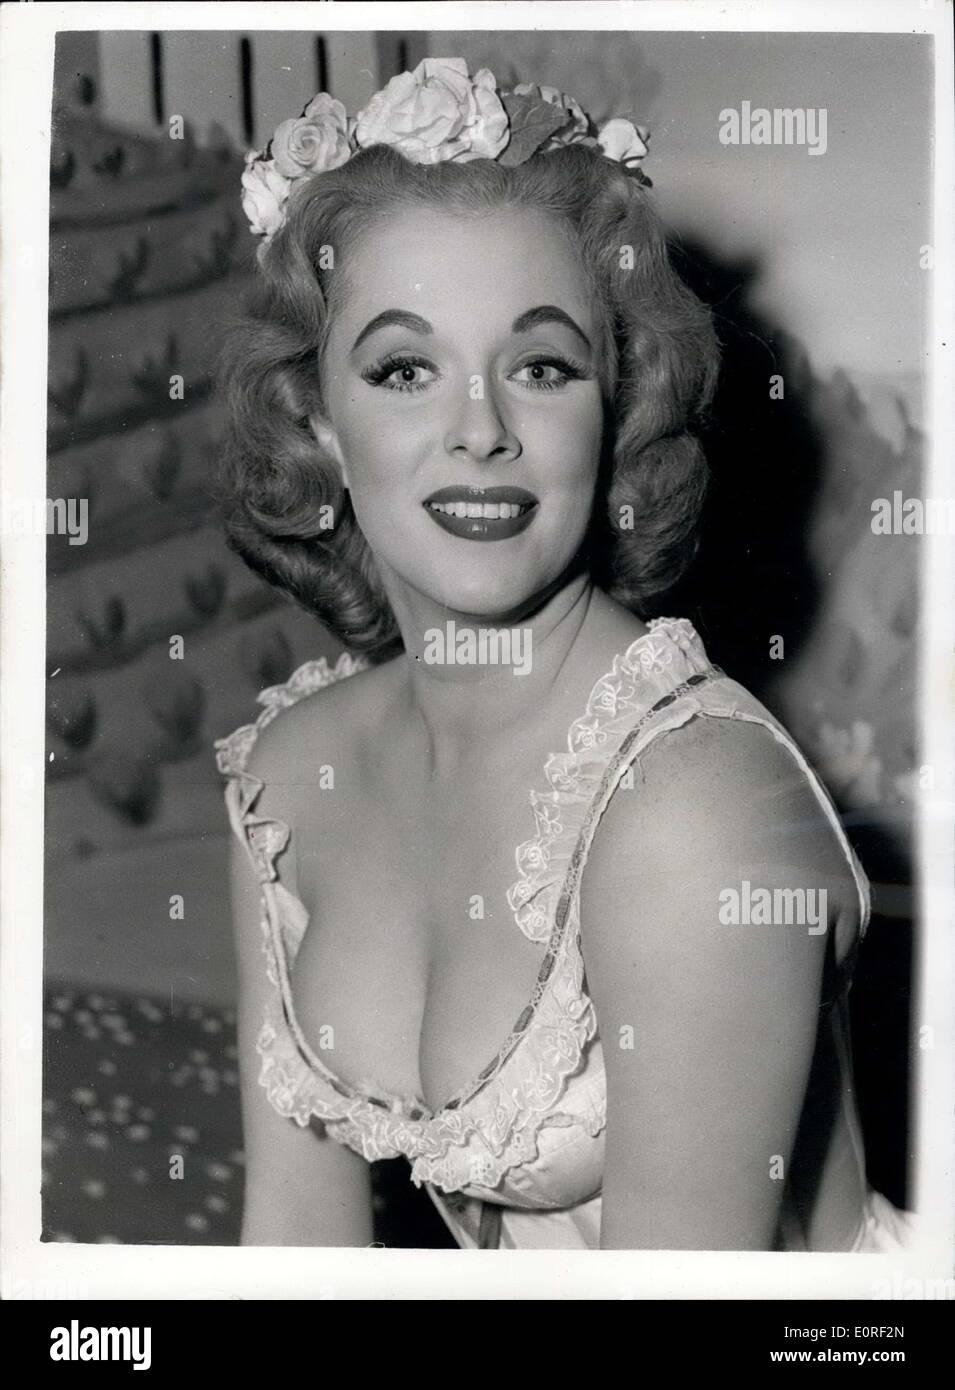 Mary Costa Stock Photos & Mary Costa Stock Images - Alamy  Mary Costa Stoc...